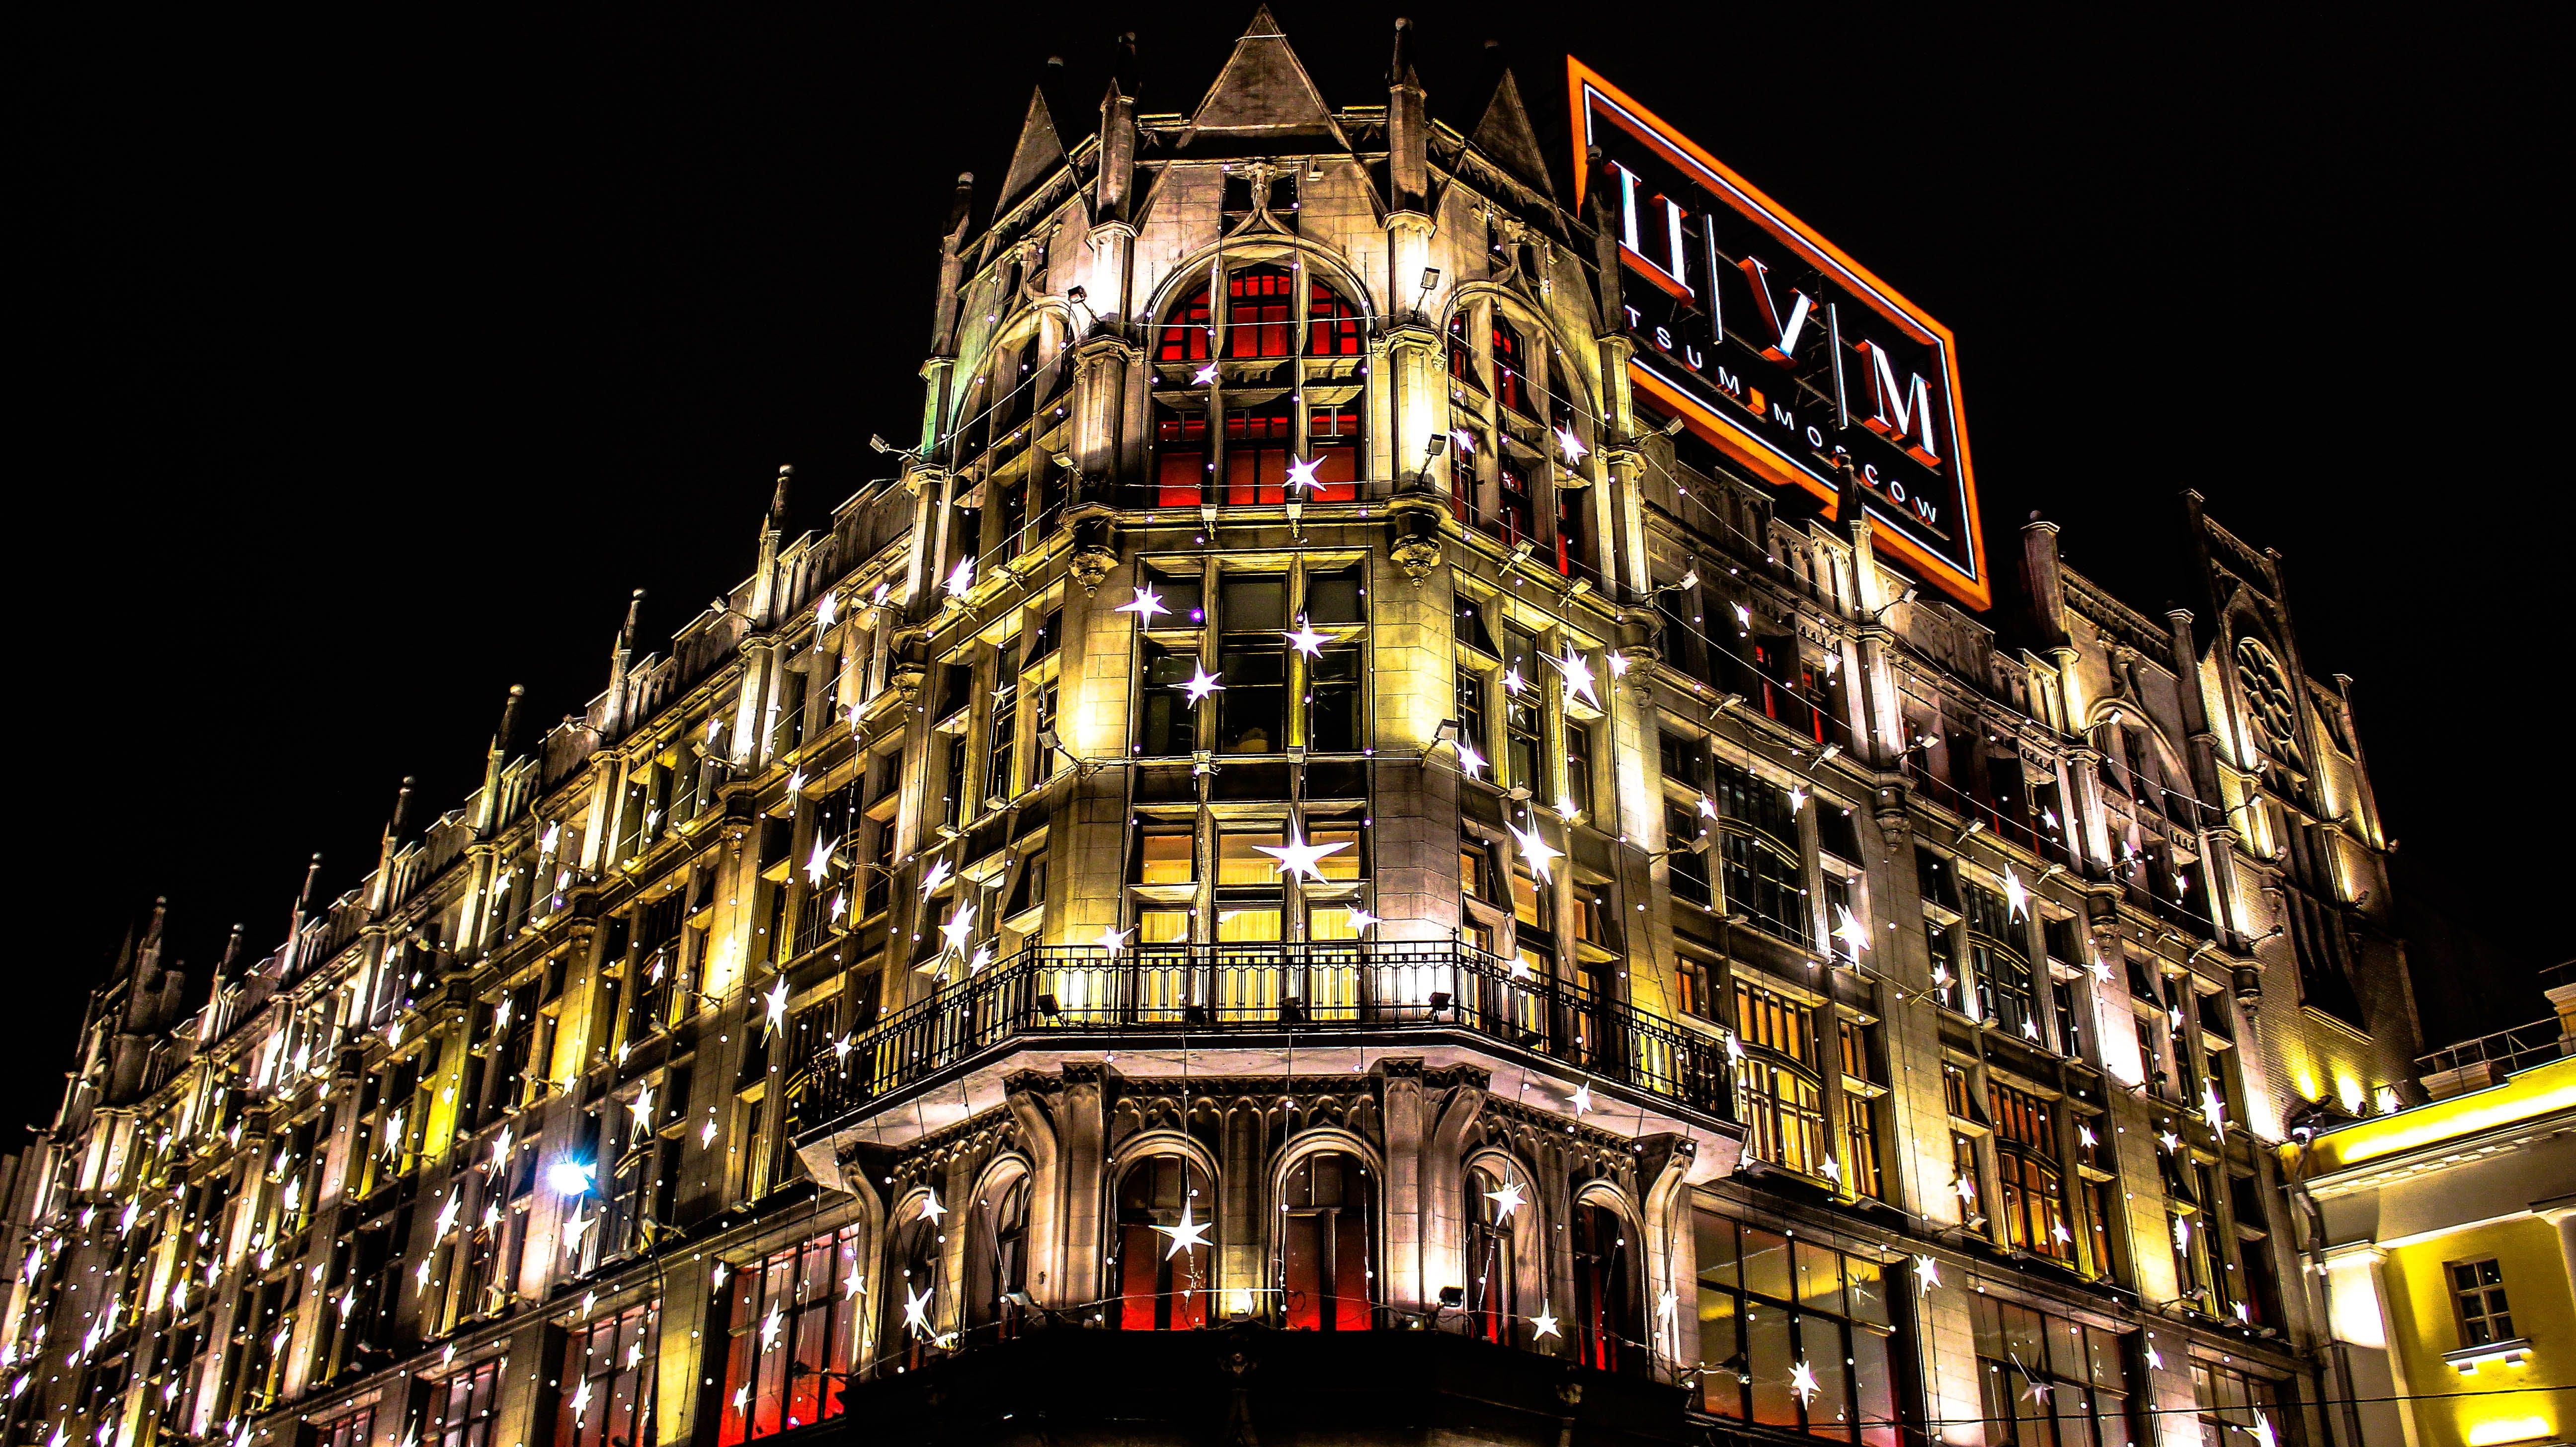 Free stock photo of lights, night, dark, building